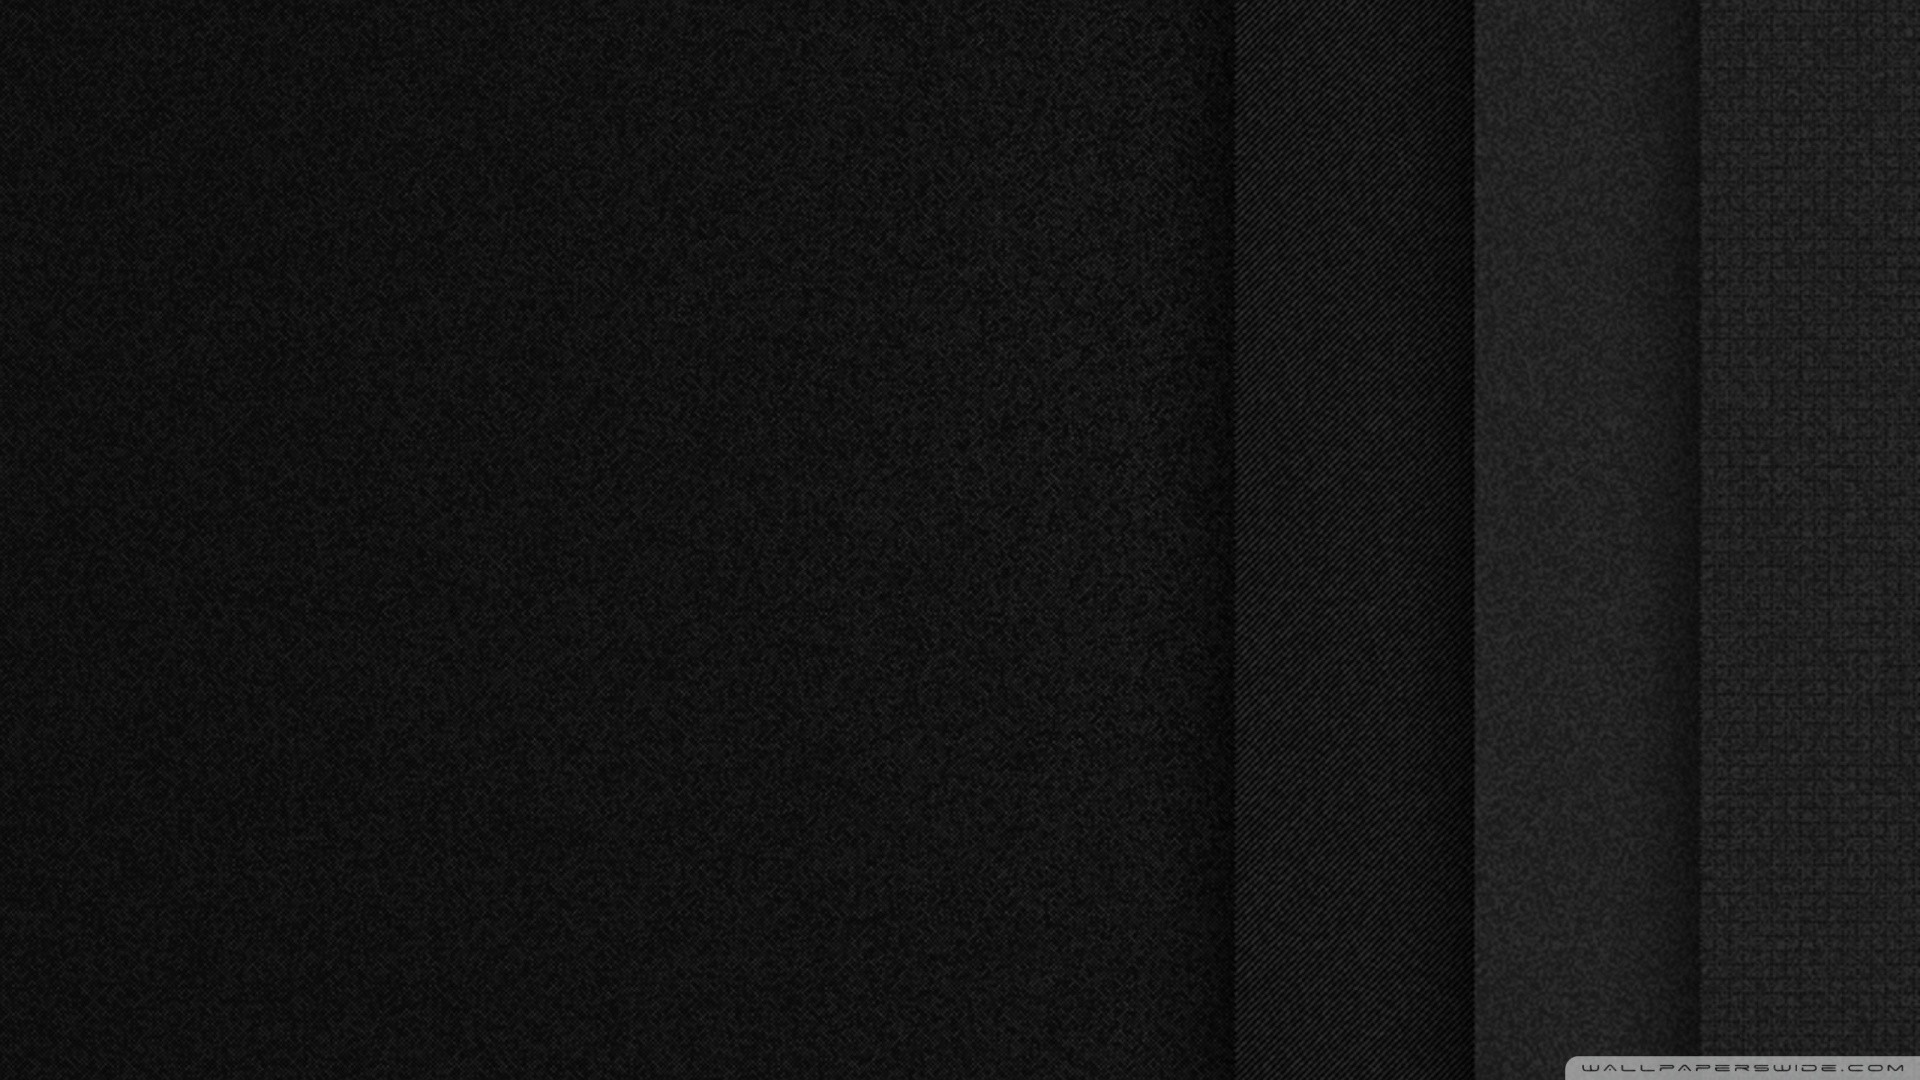 Black Hd Wallpaper 41 Wide Wallpaper. Black Hd Wallpaper  41 Wide Wallpaper